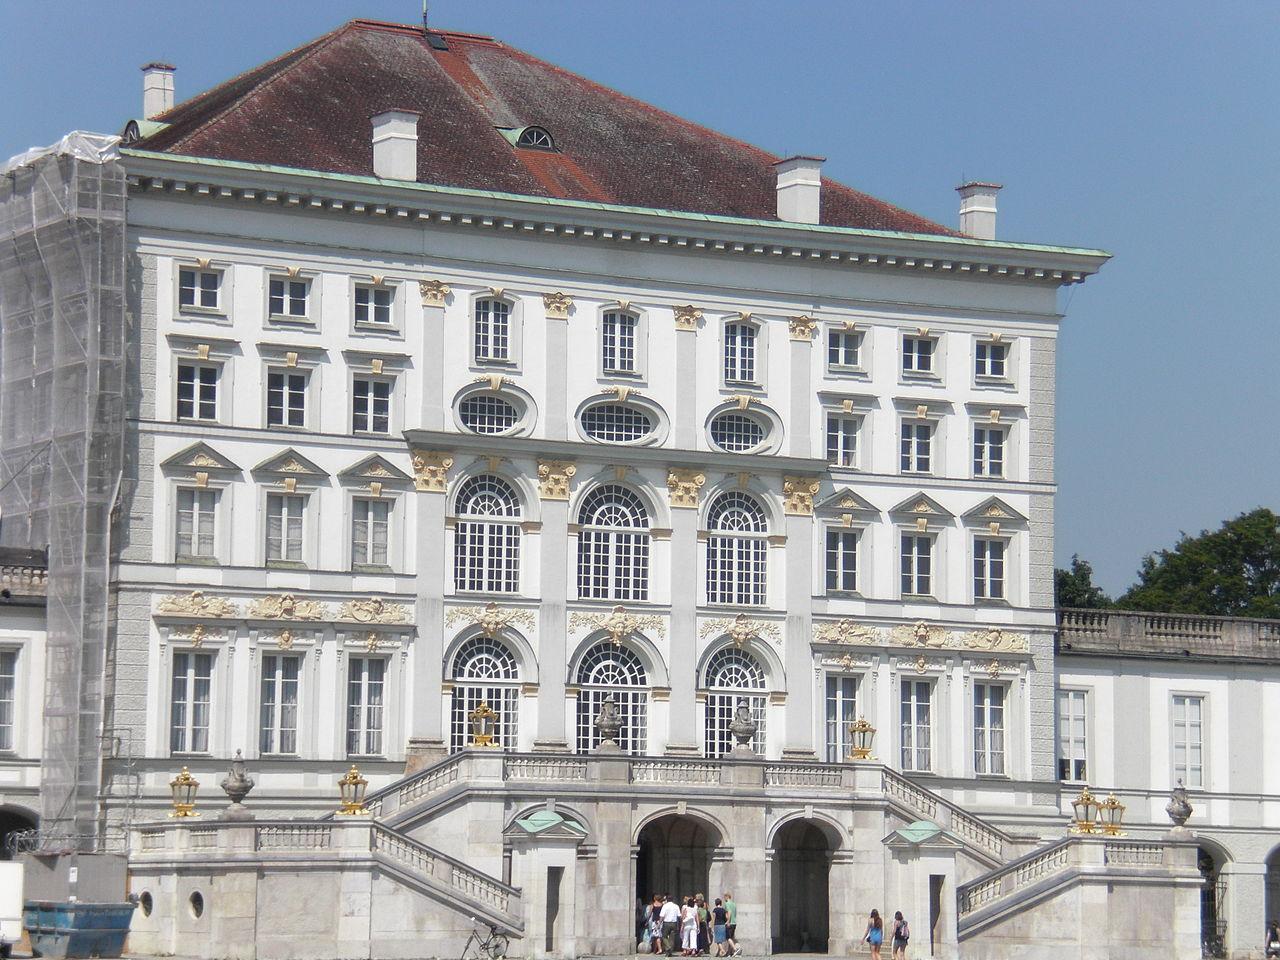 Нимфенбург, центральный фасад